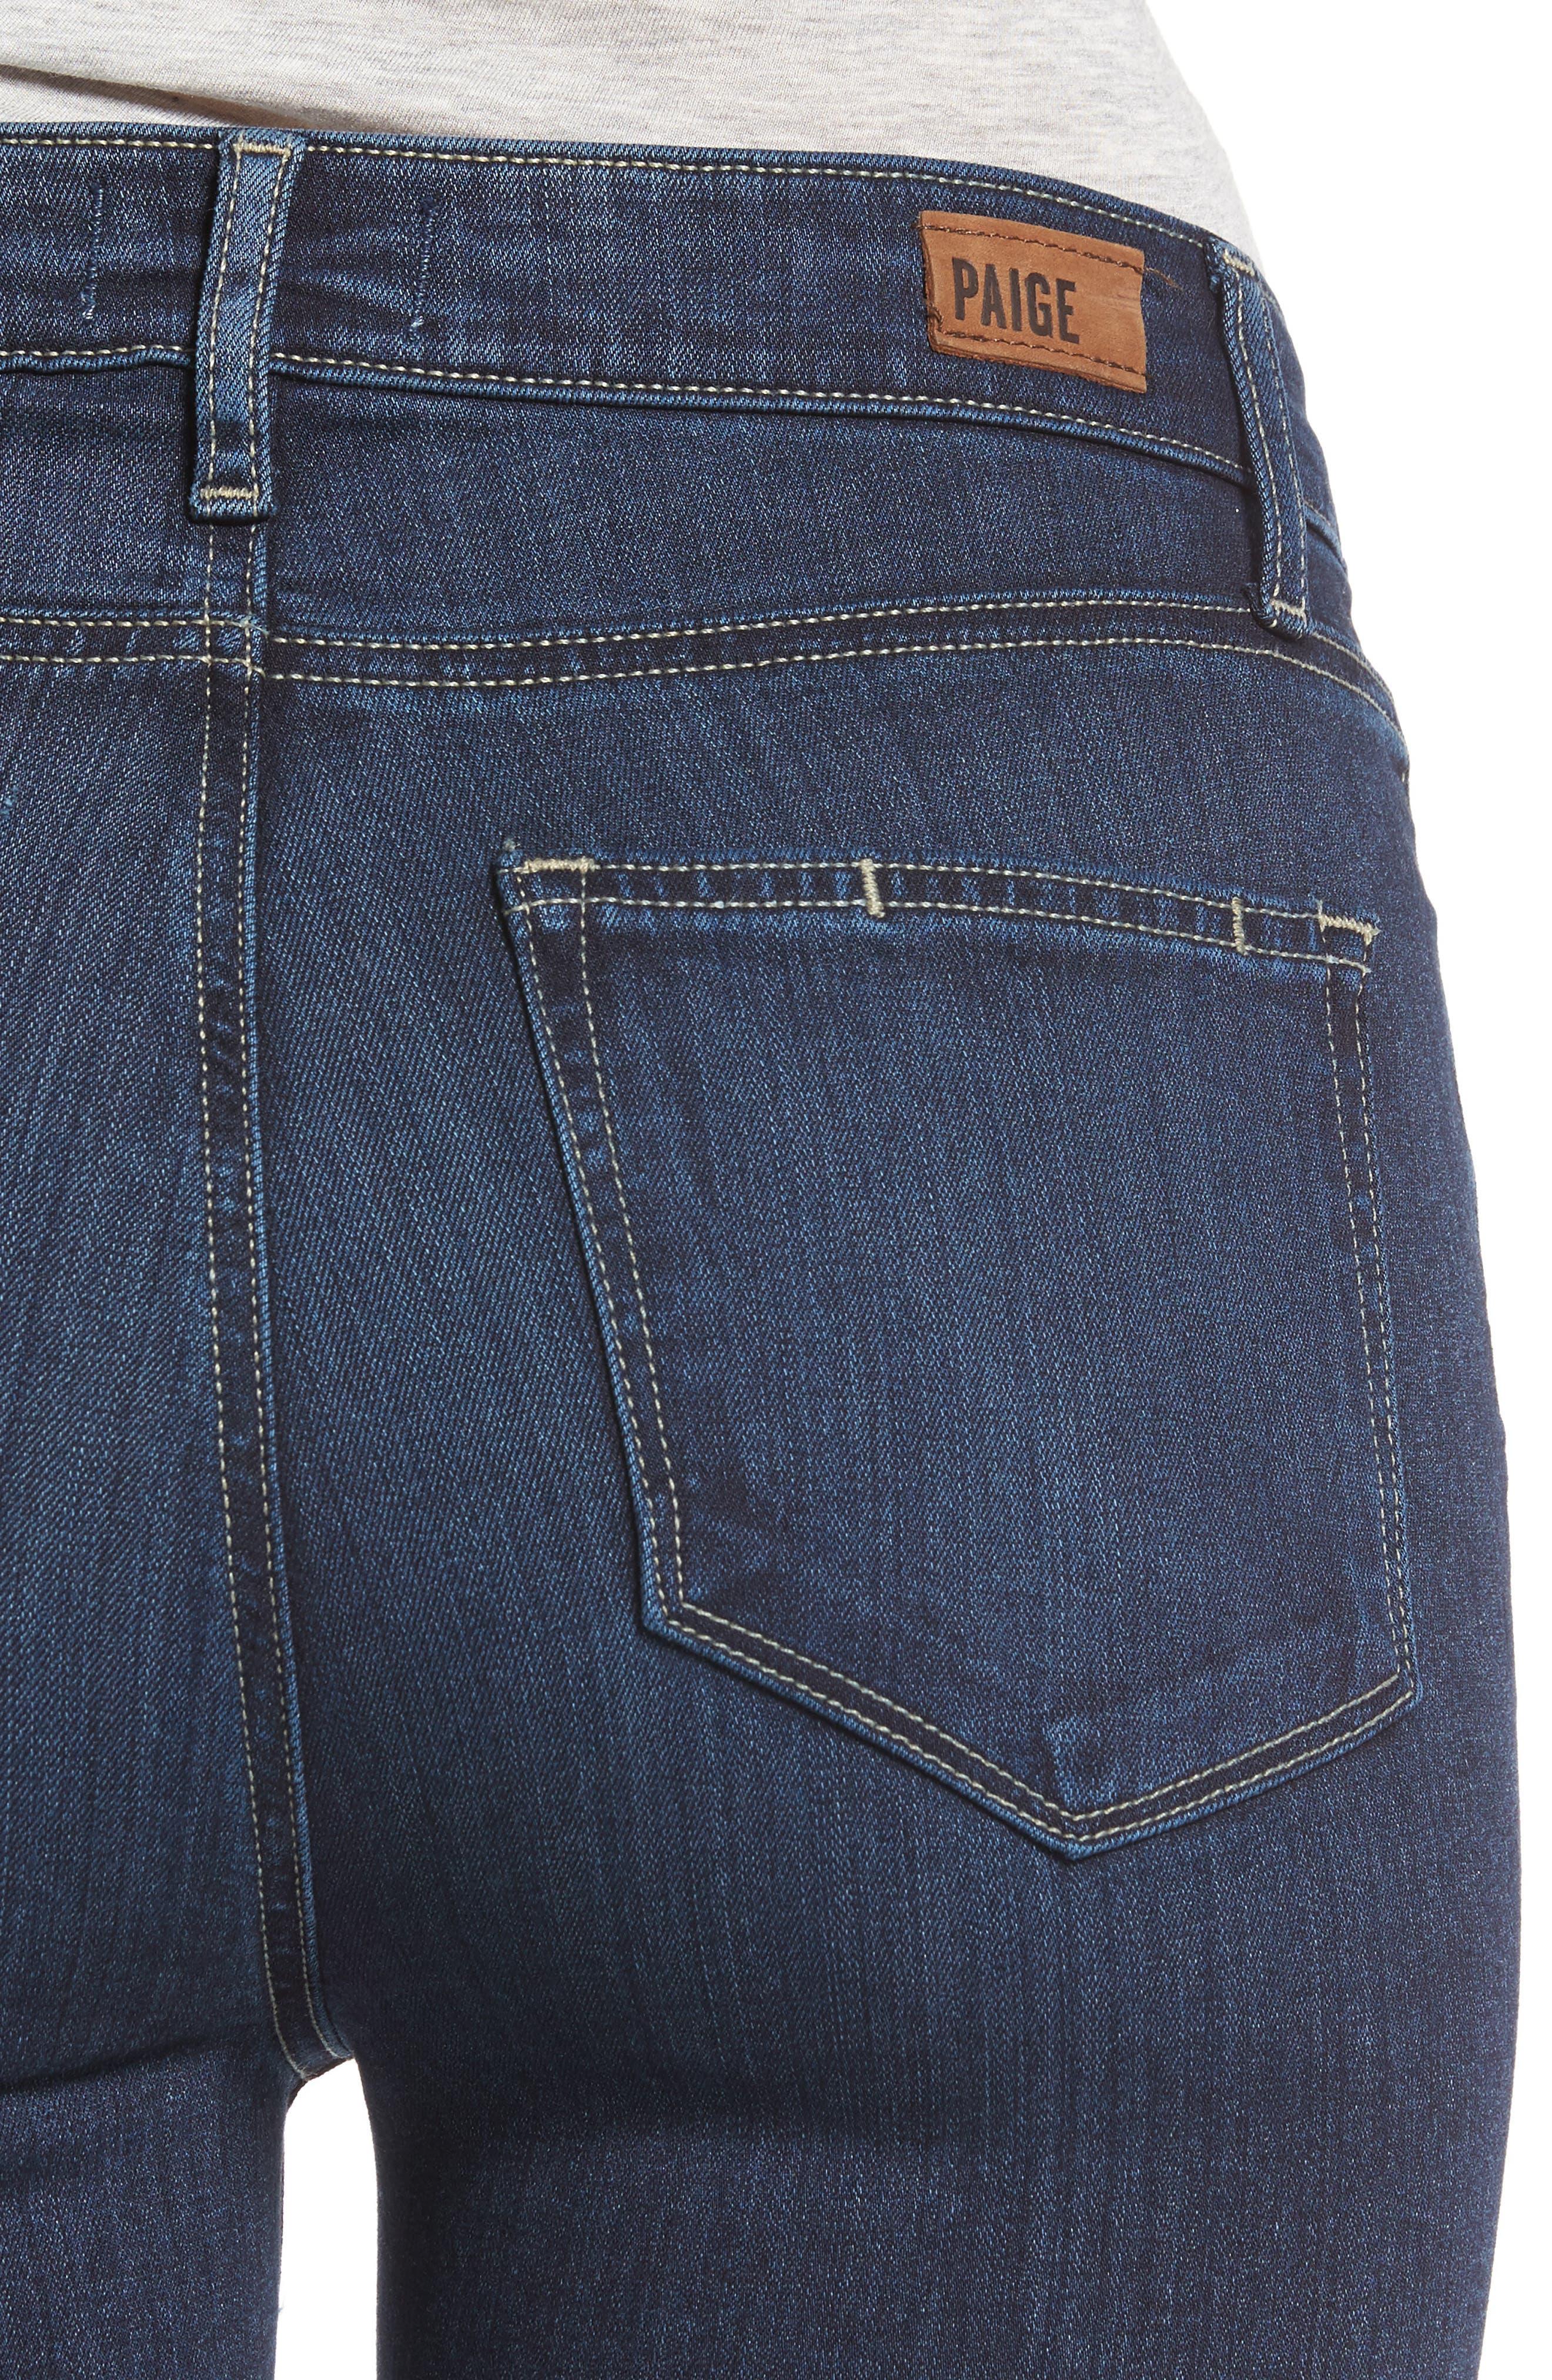 Transcend - Hoxton High Waist Ankle Skinny Jeans,                             Alternate thumbnail 4, color,                             400